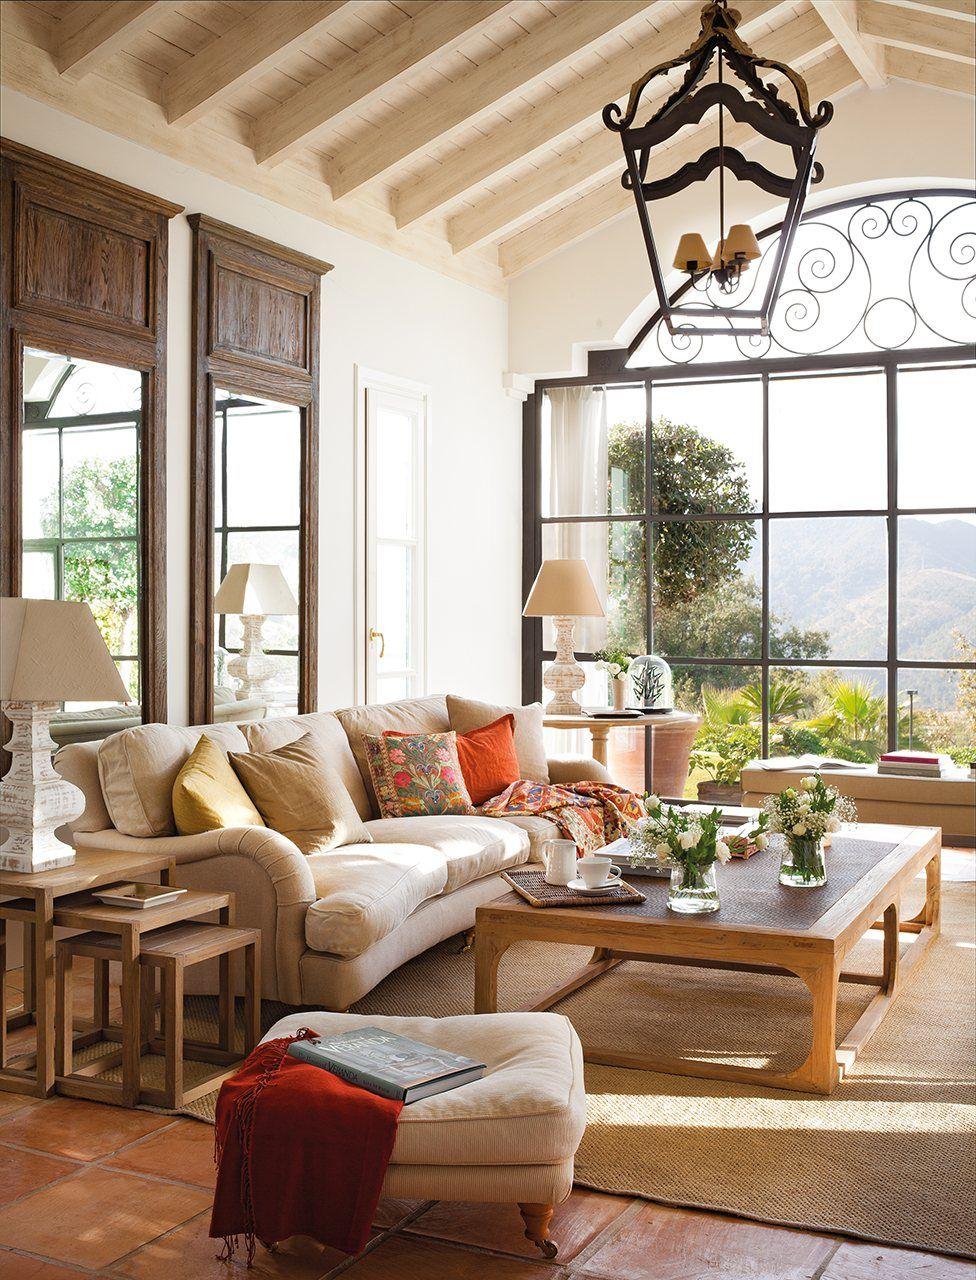 Una casa andaluza con coraz n sueco casas for Casa andaluza